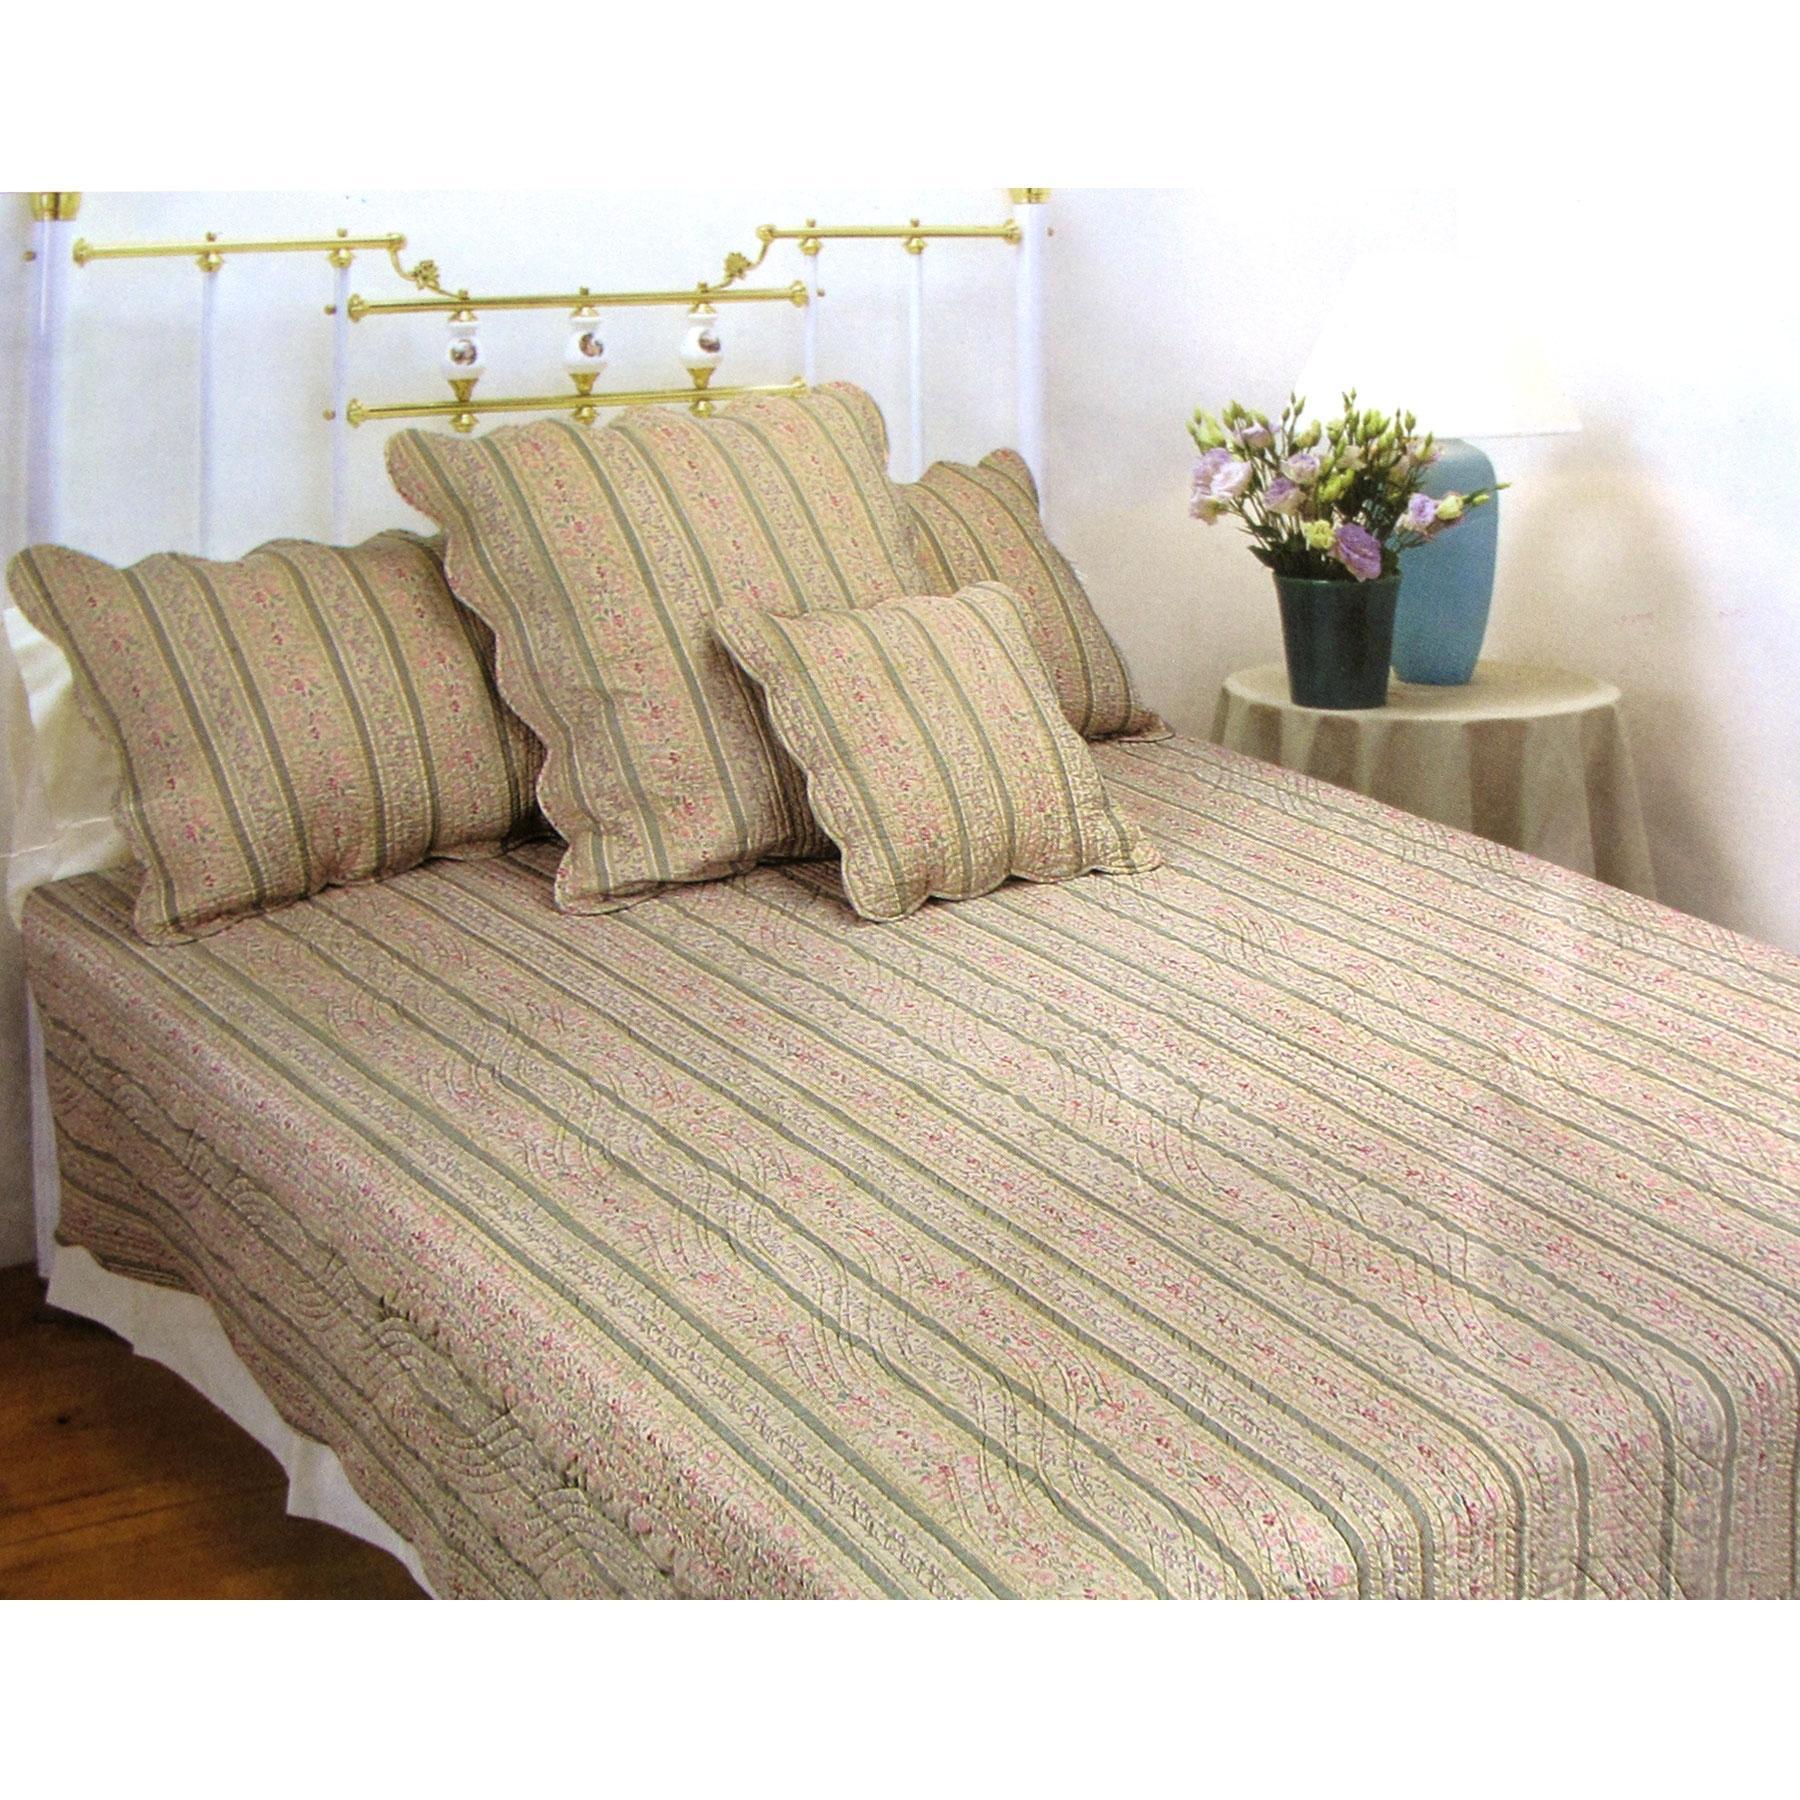 3 Pce 100 Cotton Regency Linen Olive King Coverlet Bedspread Set Matt Blatt